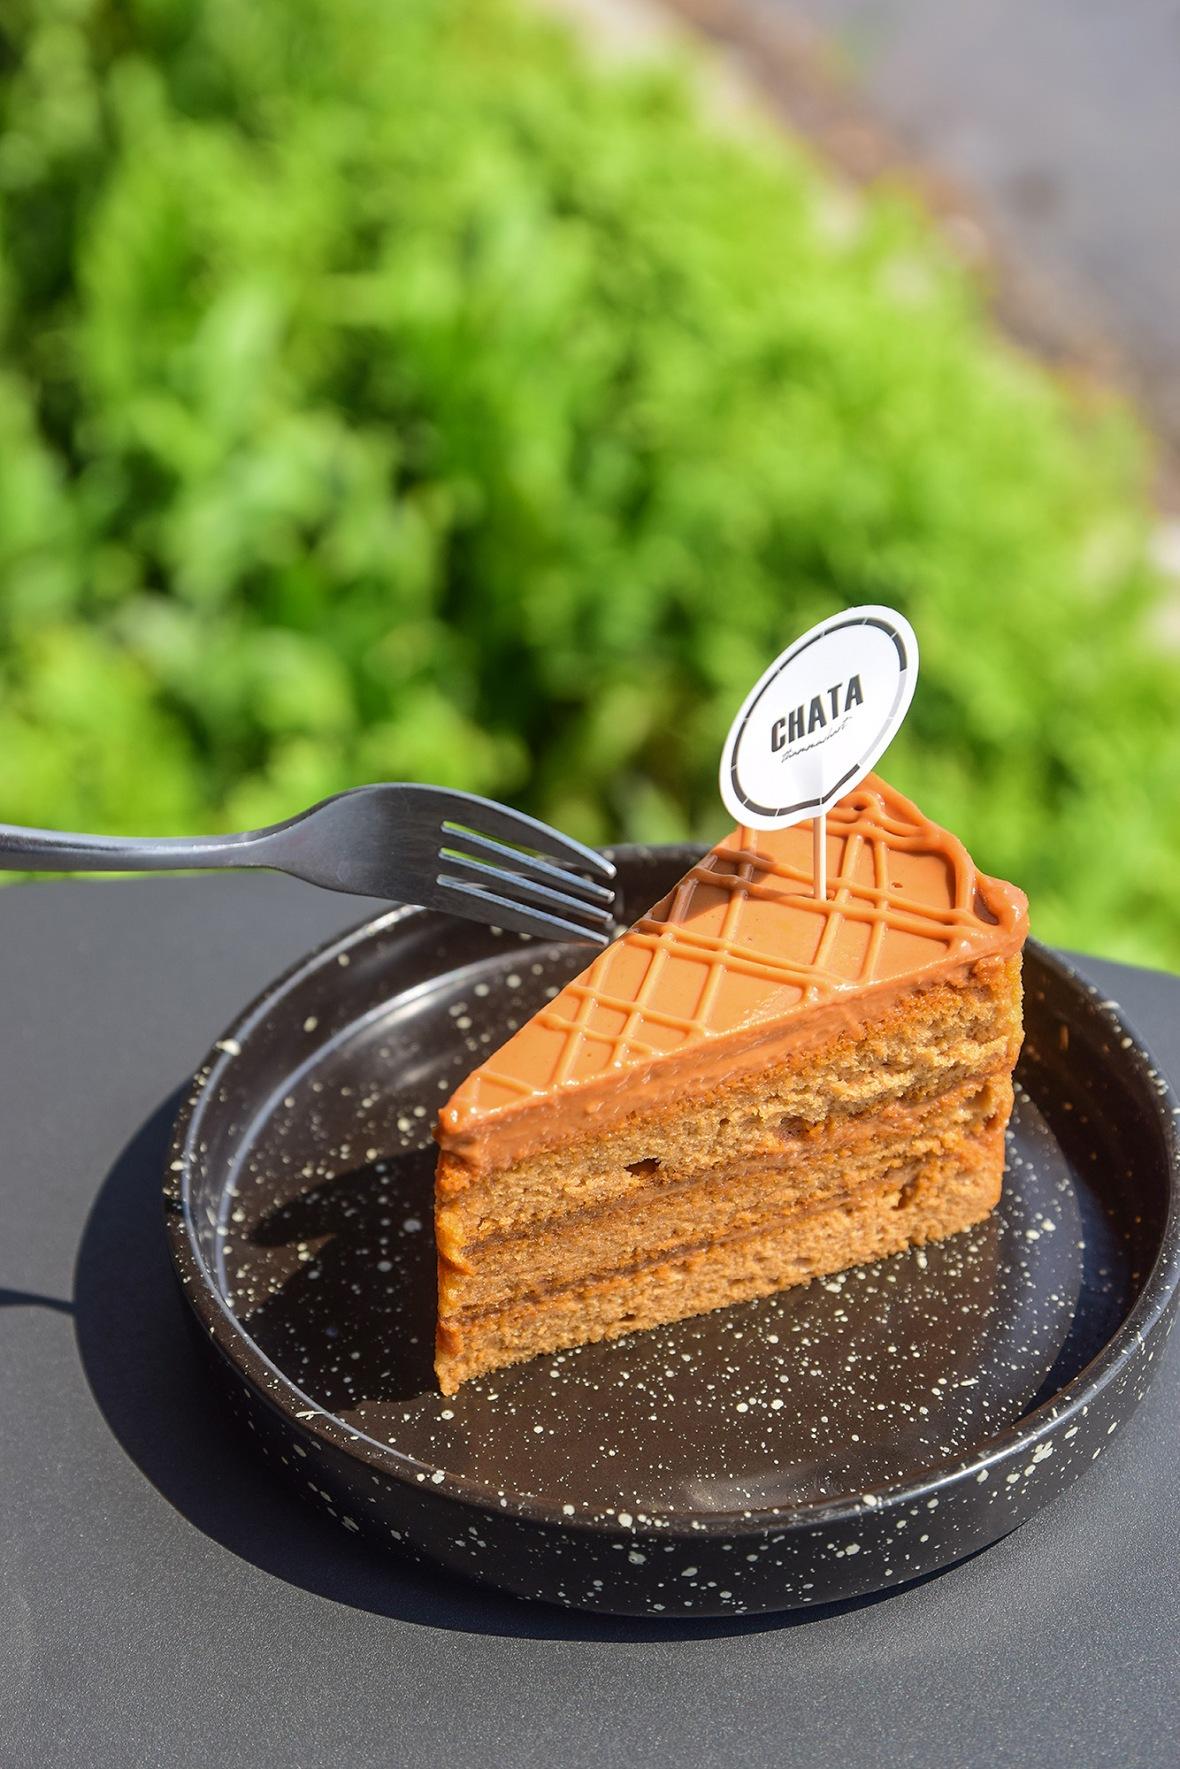 Chata thammachart Cafe&Bistro (39)